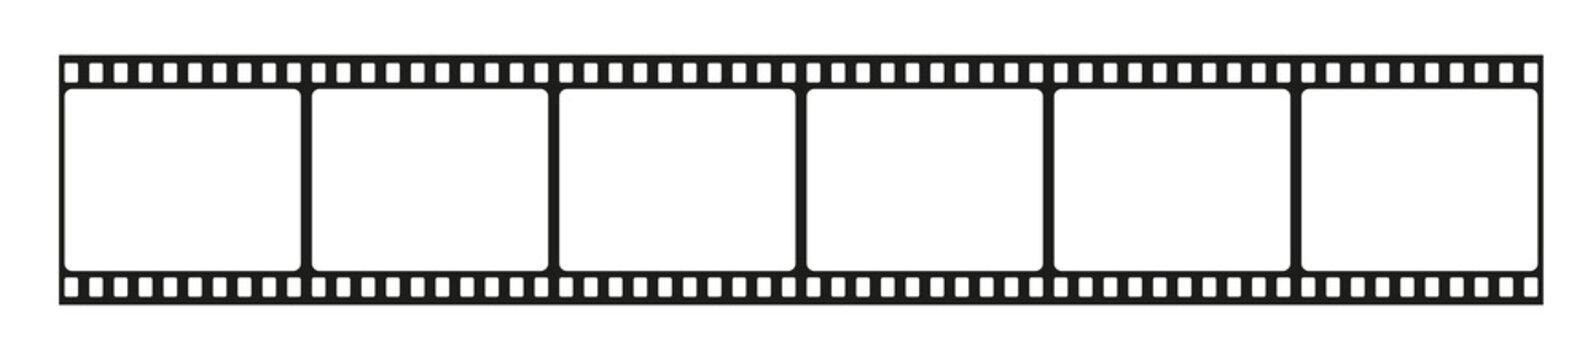 Filmstrip - W